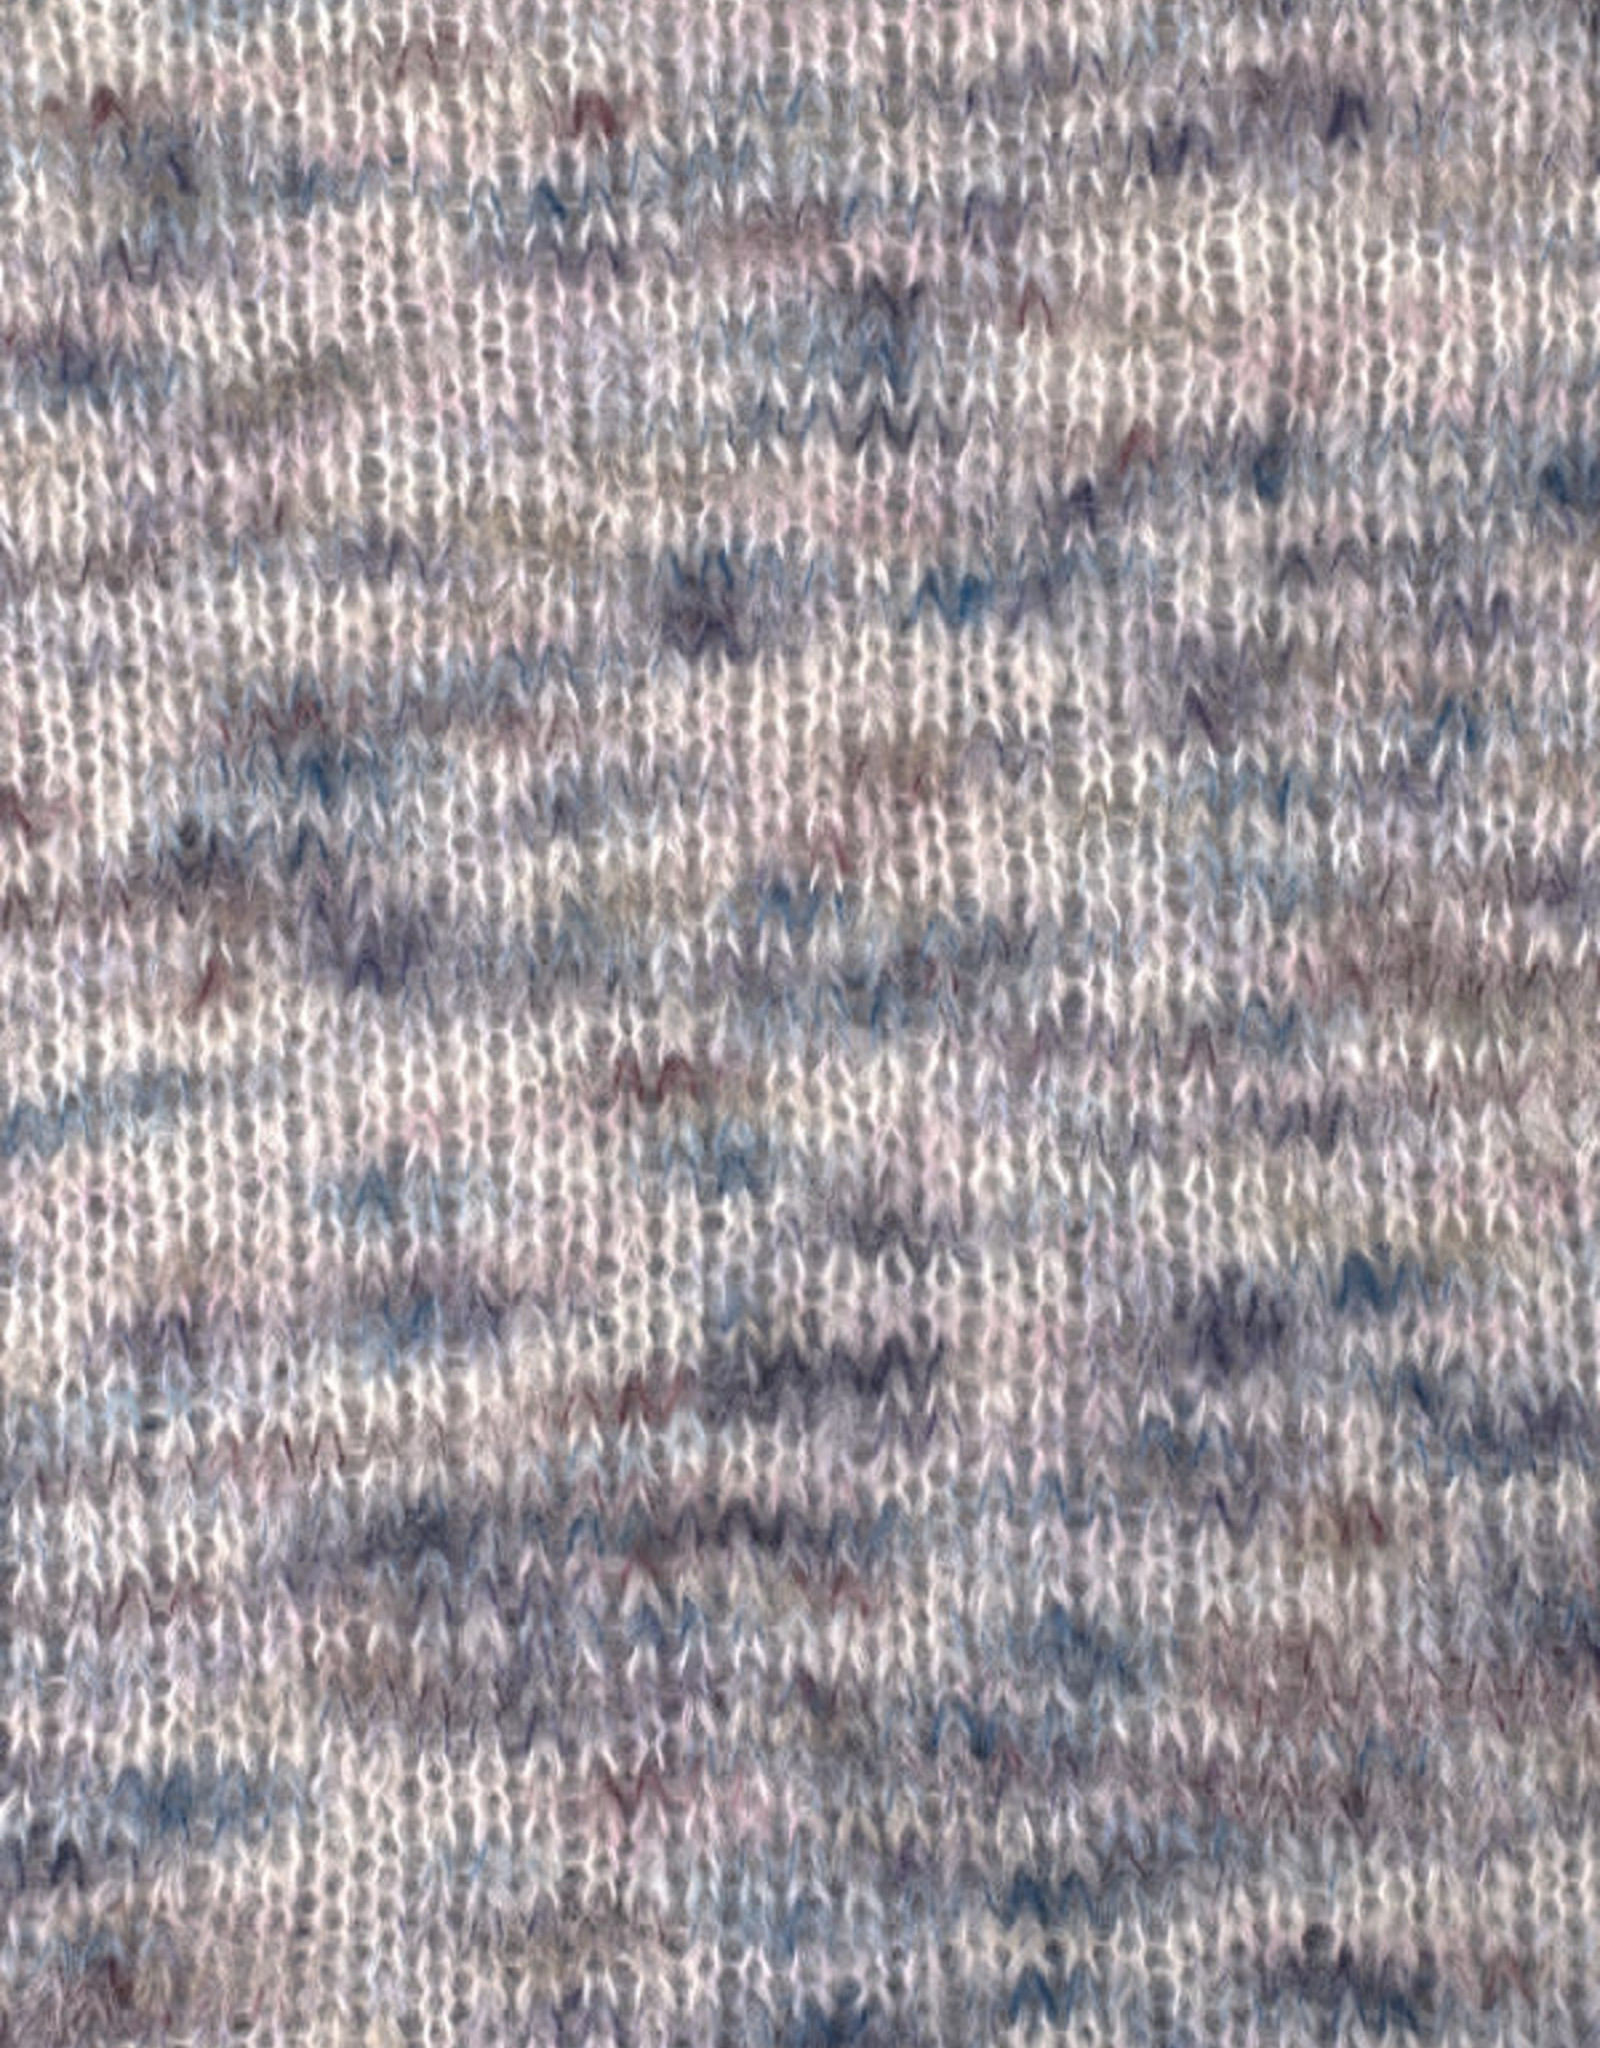 Berroco Artesia 4804 iris